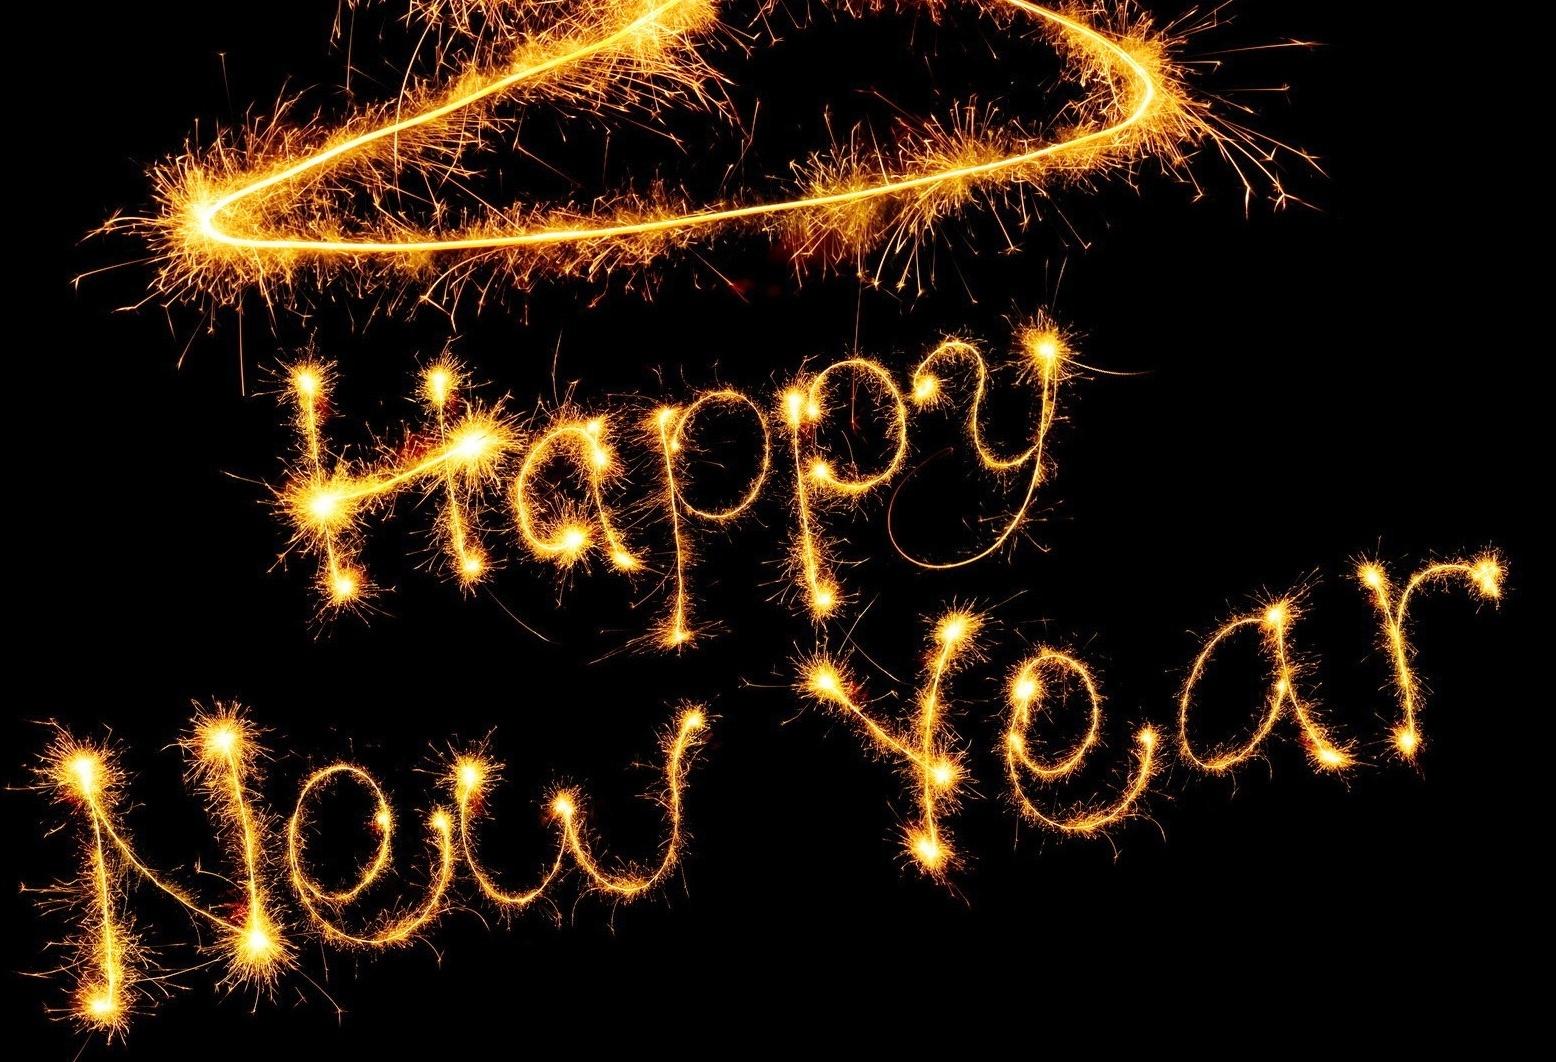 Wishing everyone a most joyful new year 2014 taman sri nibong ra log happy new year 2014 hd wallpaper m4hsunfo